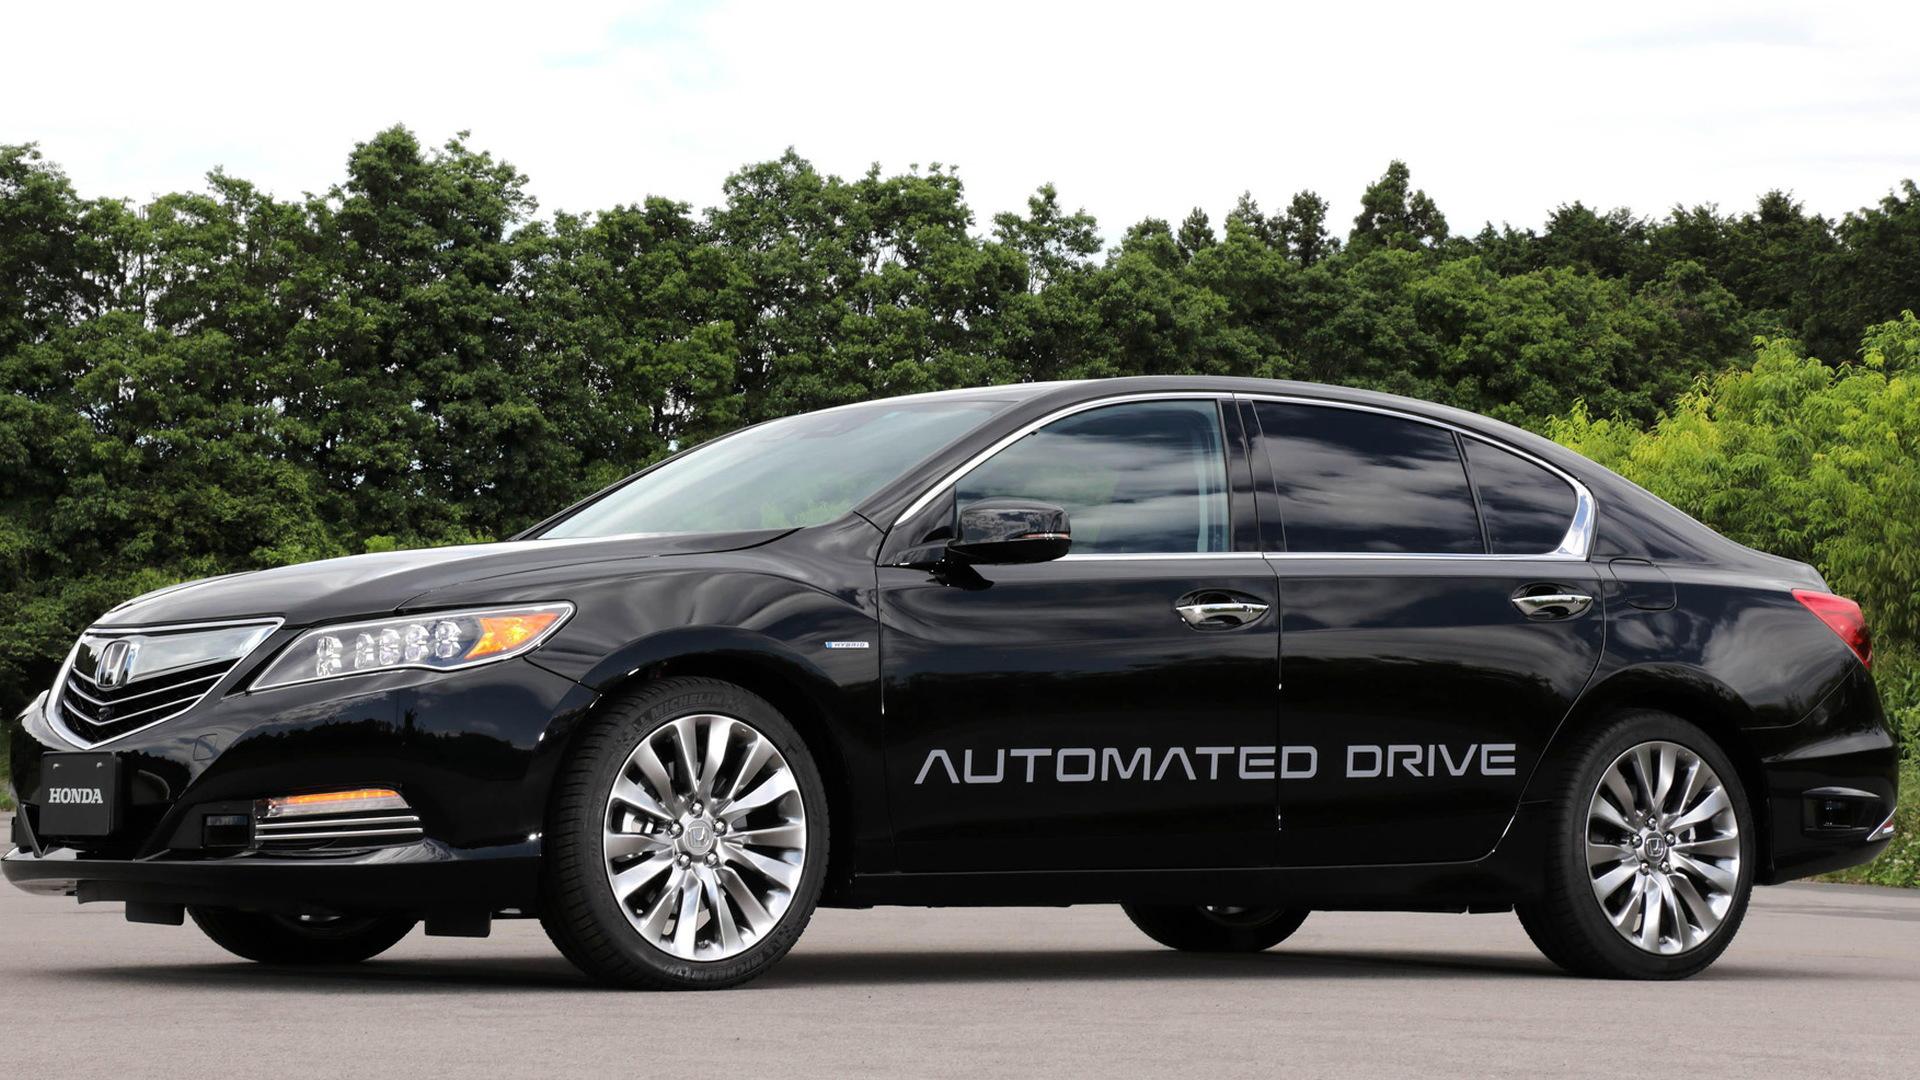 Honda self-driving car prototype